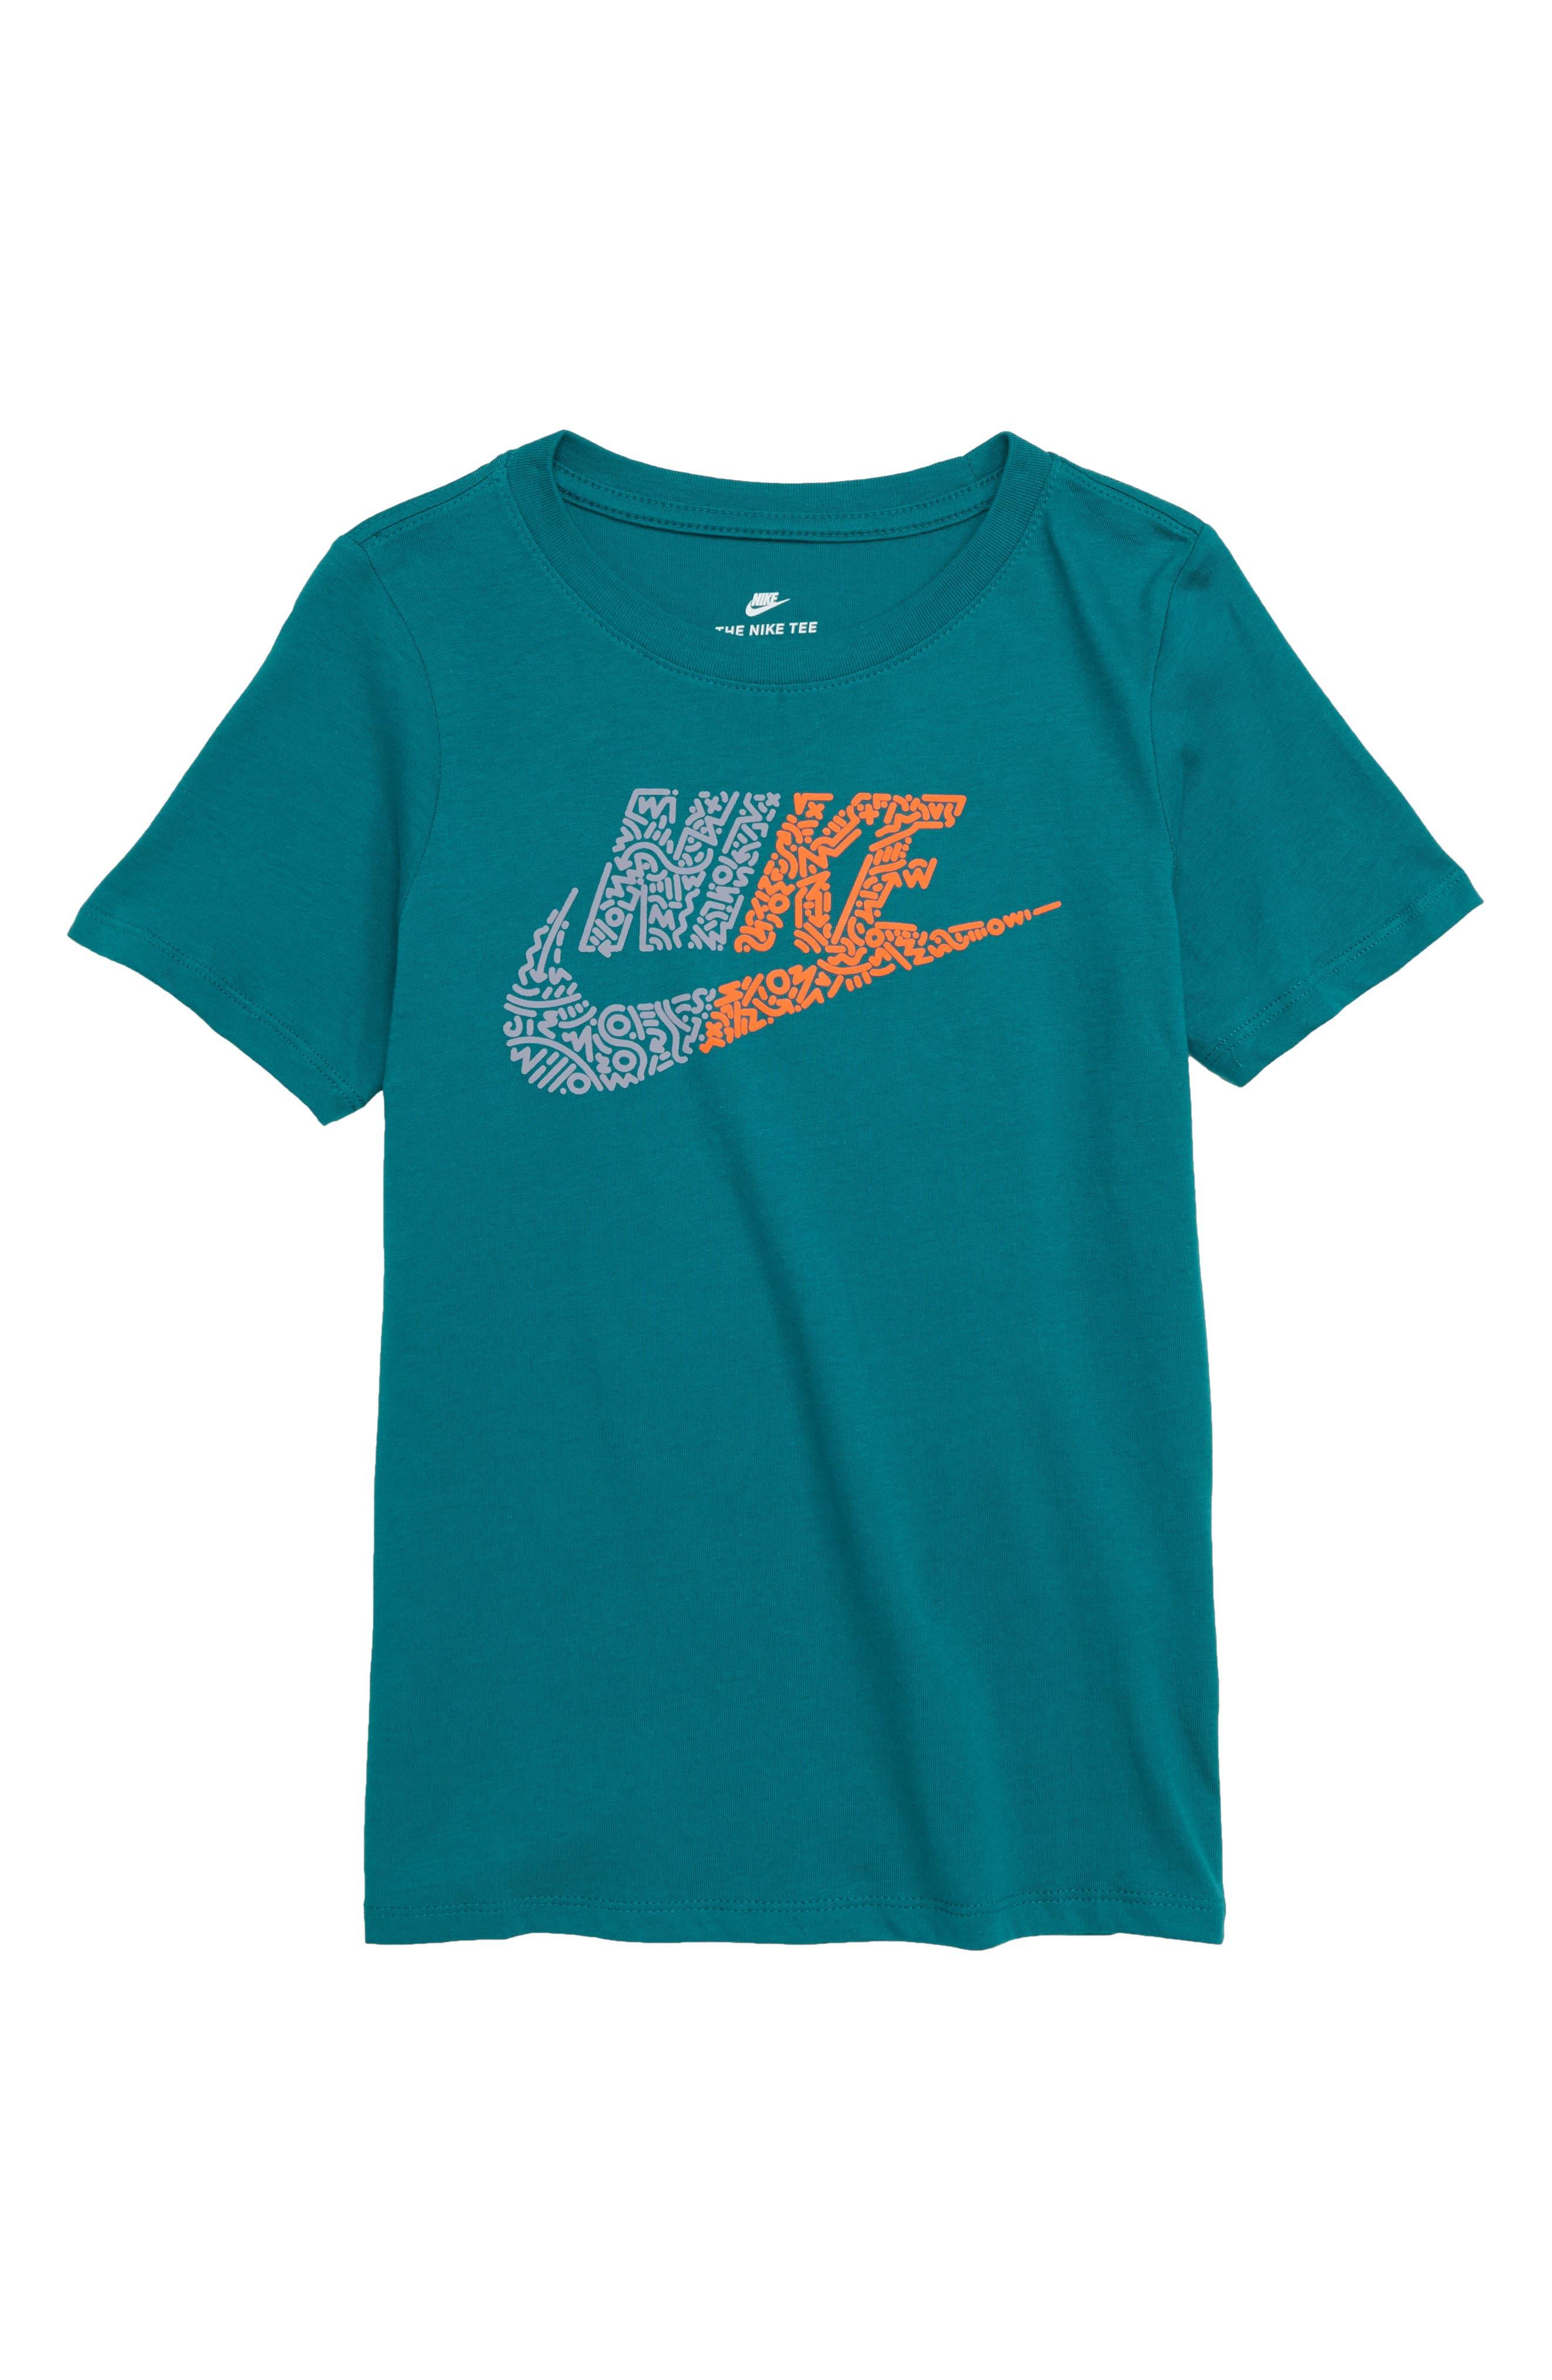 Sportswear Futura T-Shirt,                             Main thumbnail 1, color,                             GEODE TEAL/ ASHEN SLATE